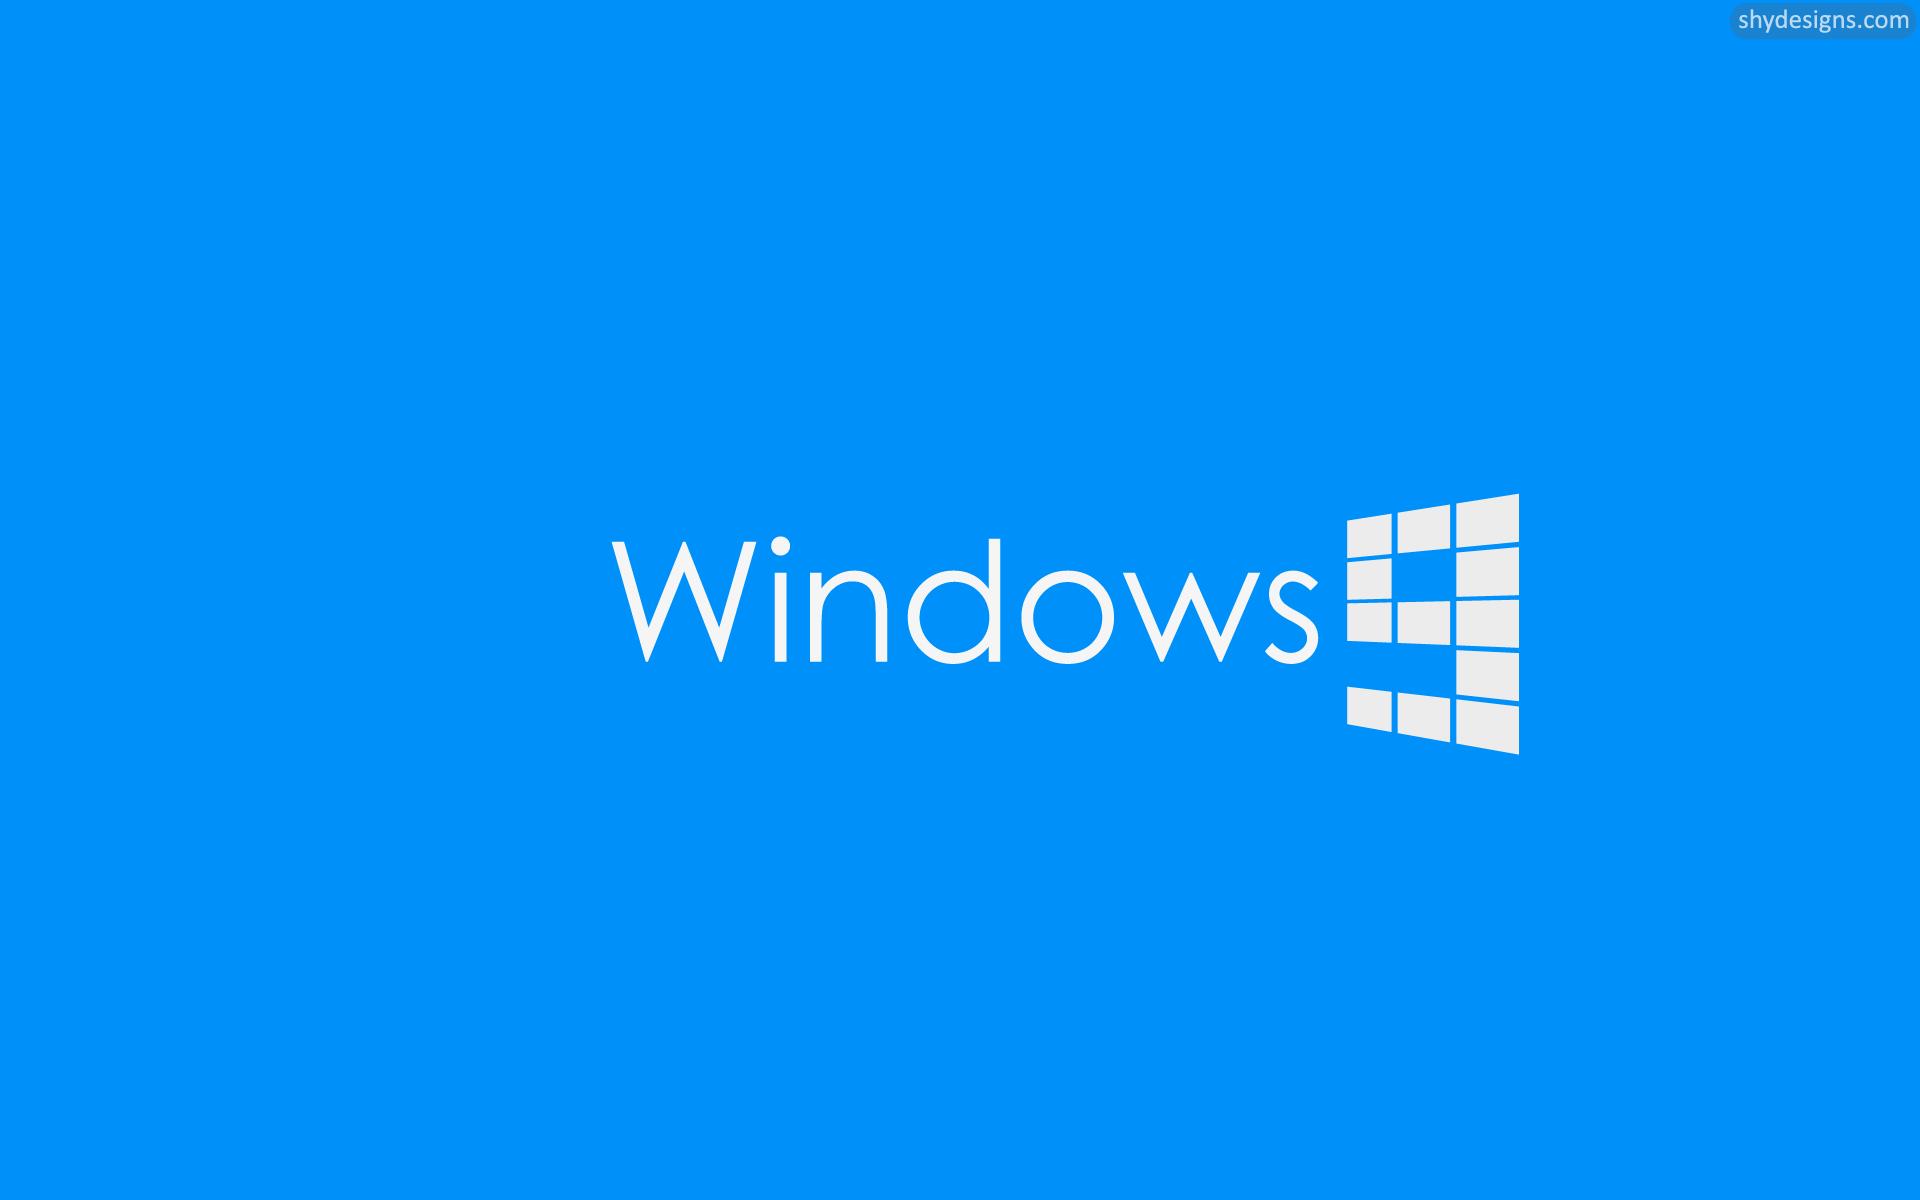 1280x800 logo windows - photo #33